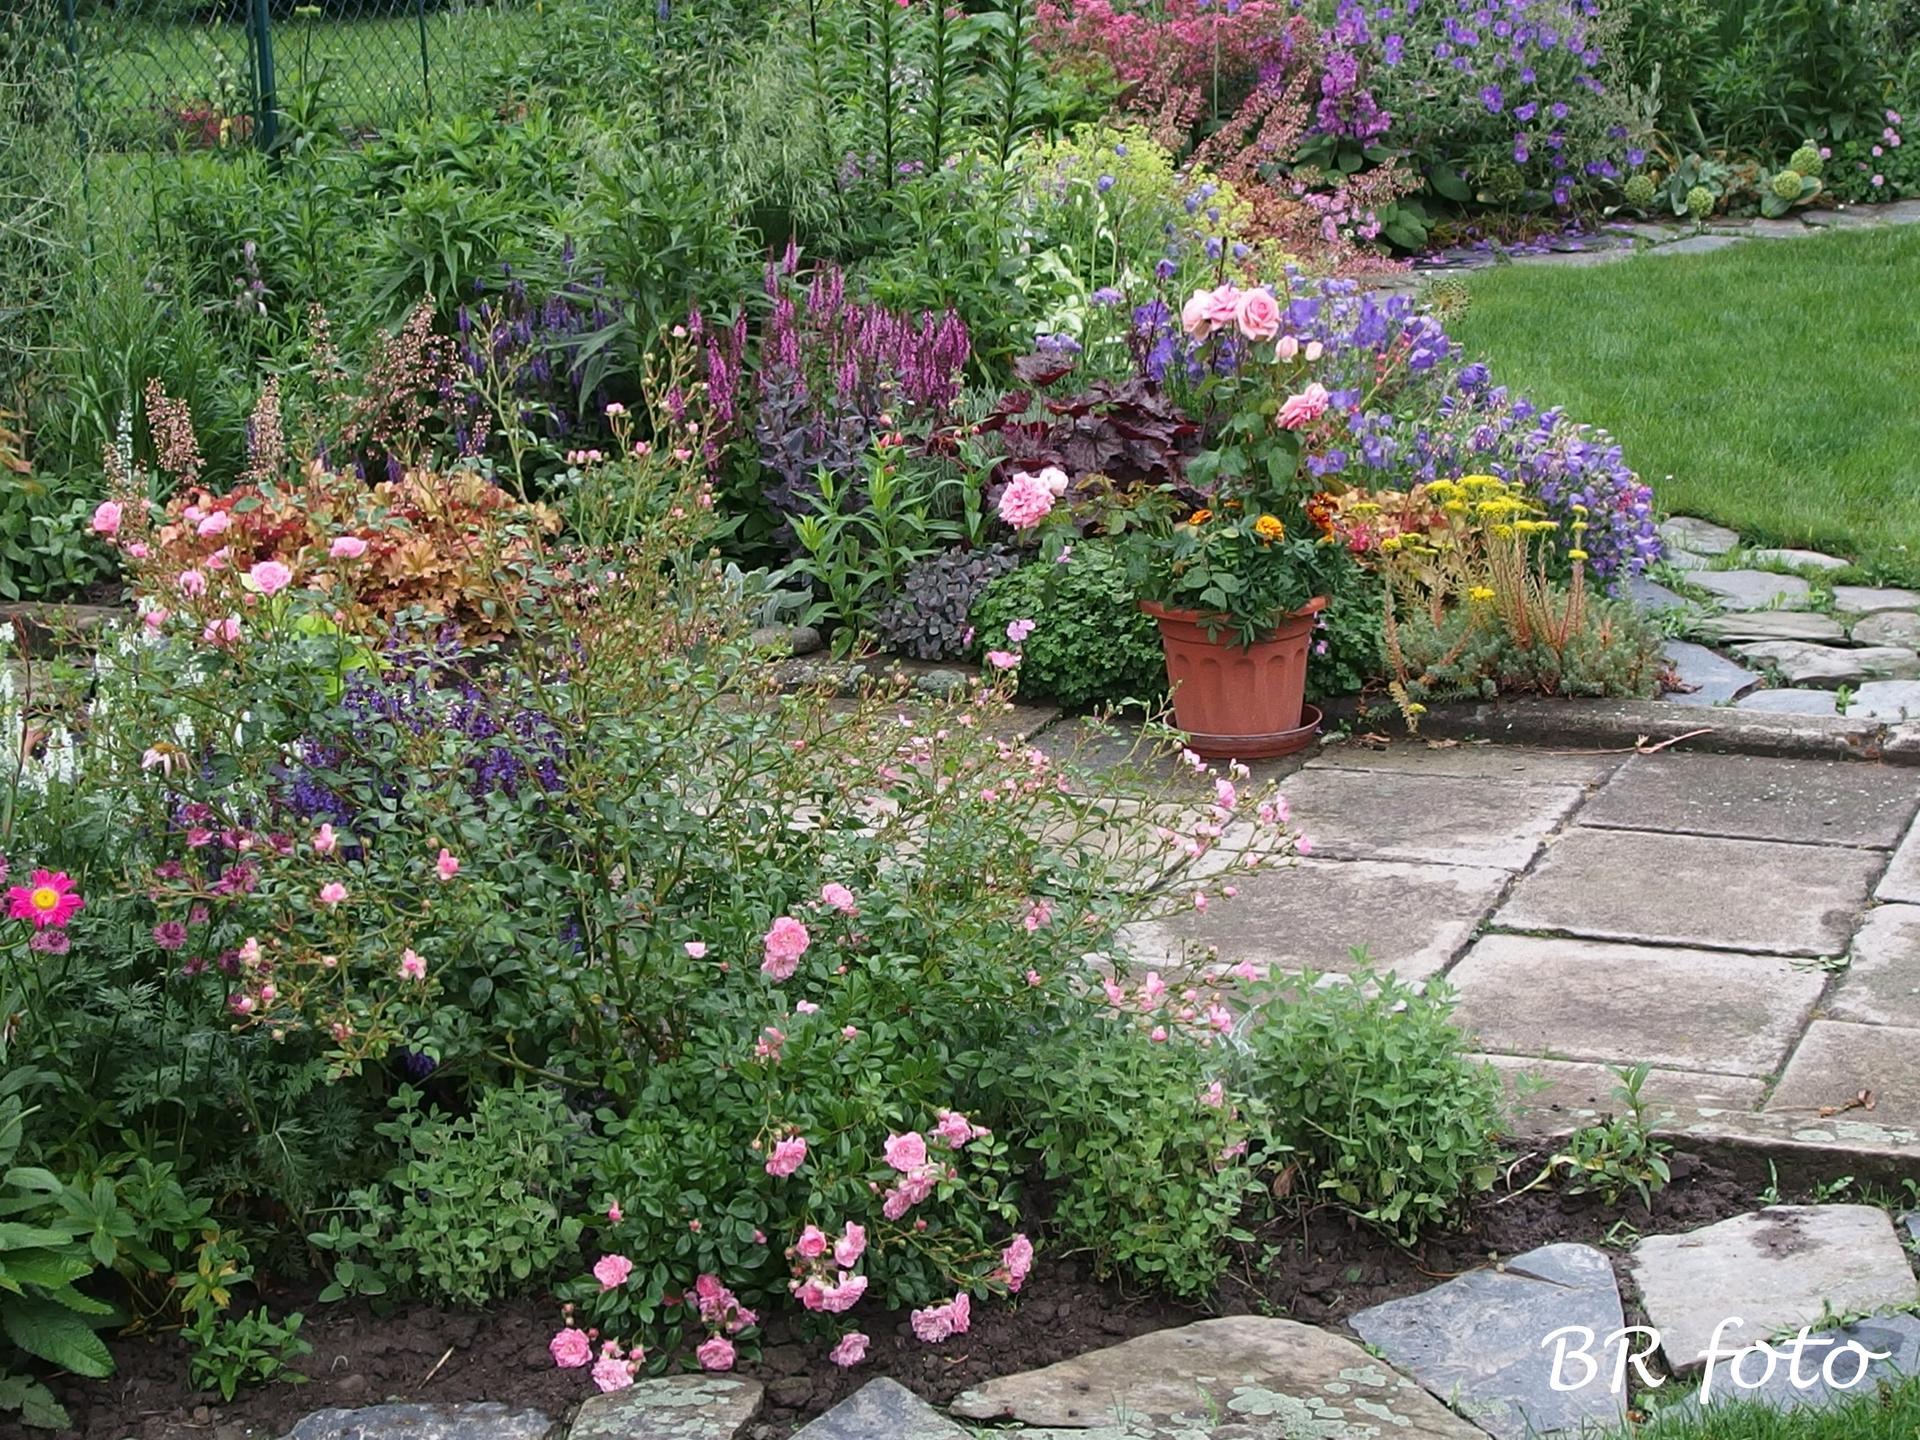 Zahrada v červnu - vše roste a kvete jako o život.... - předzahrádka